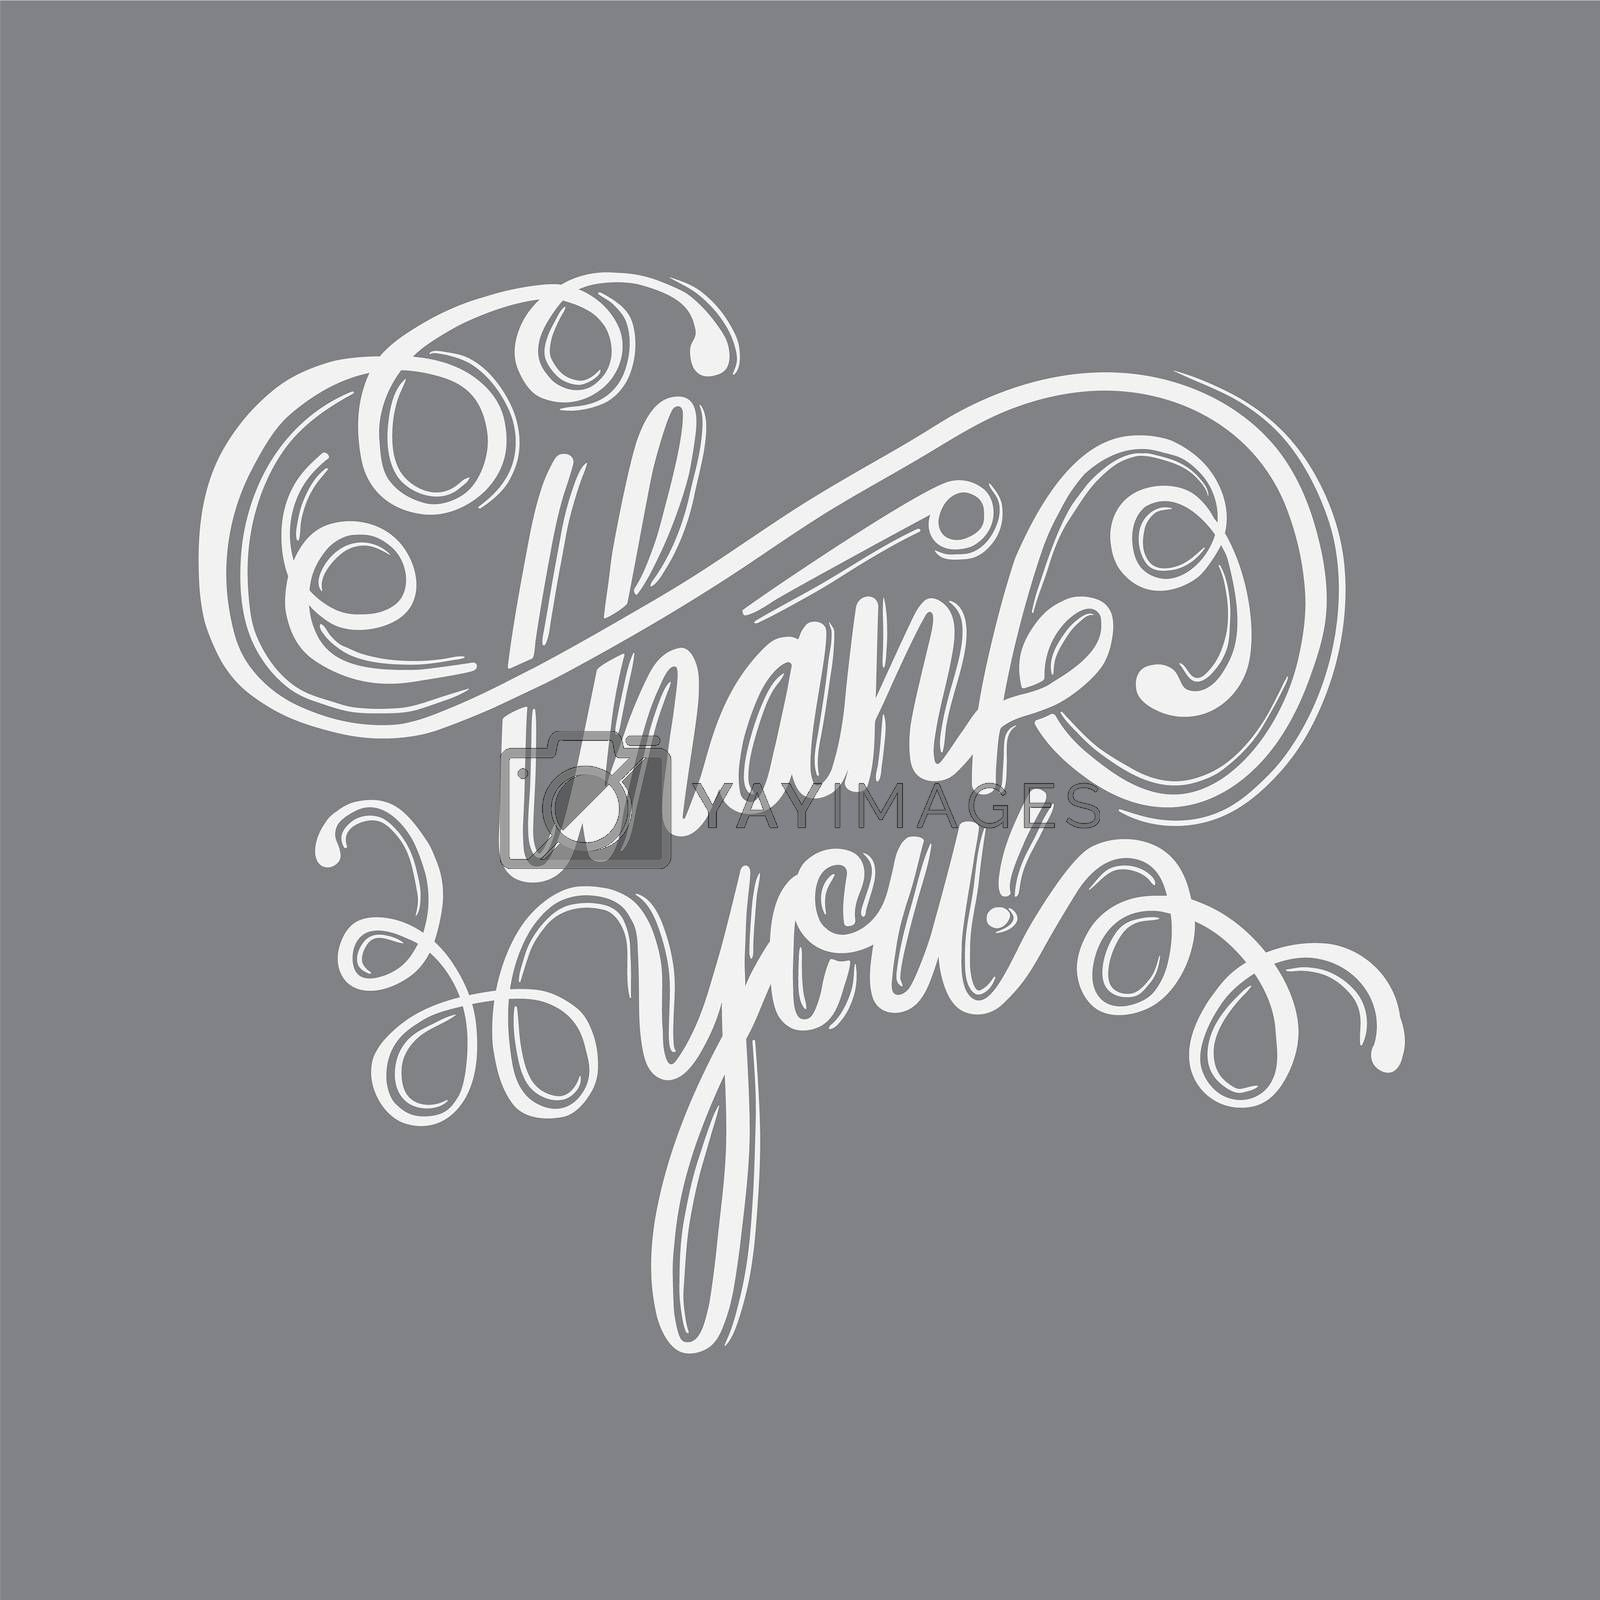 Digitally generated Thank you in cursive script